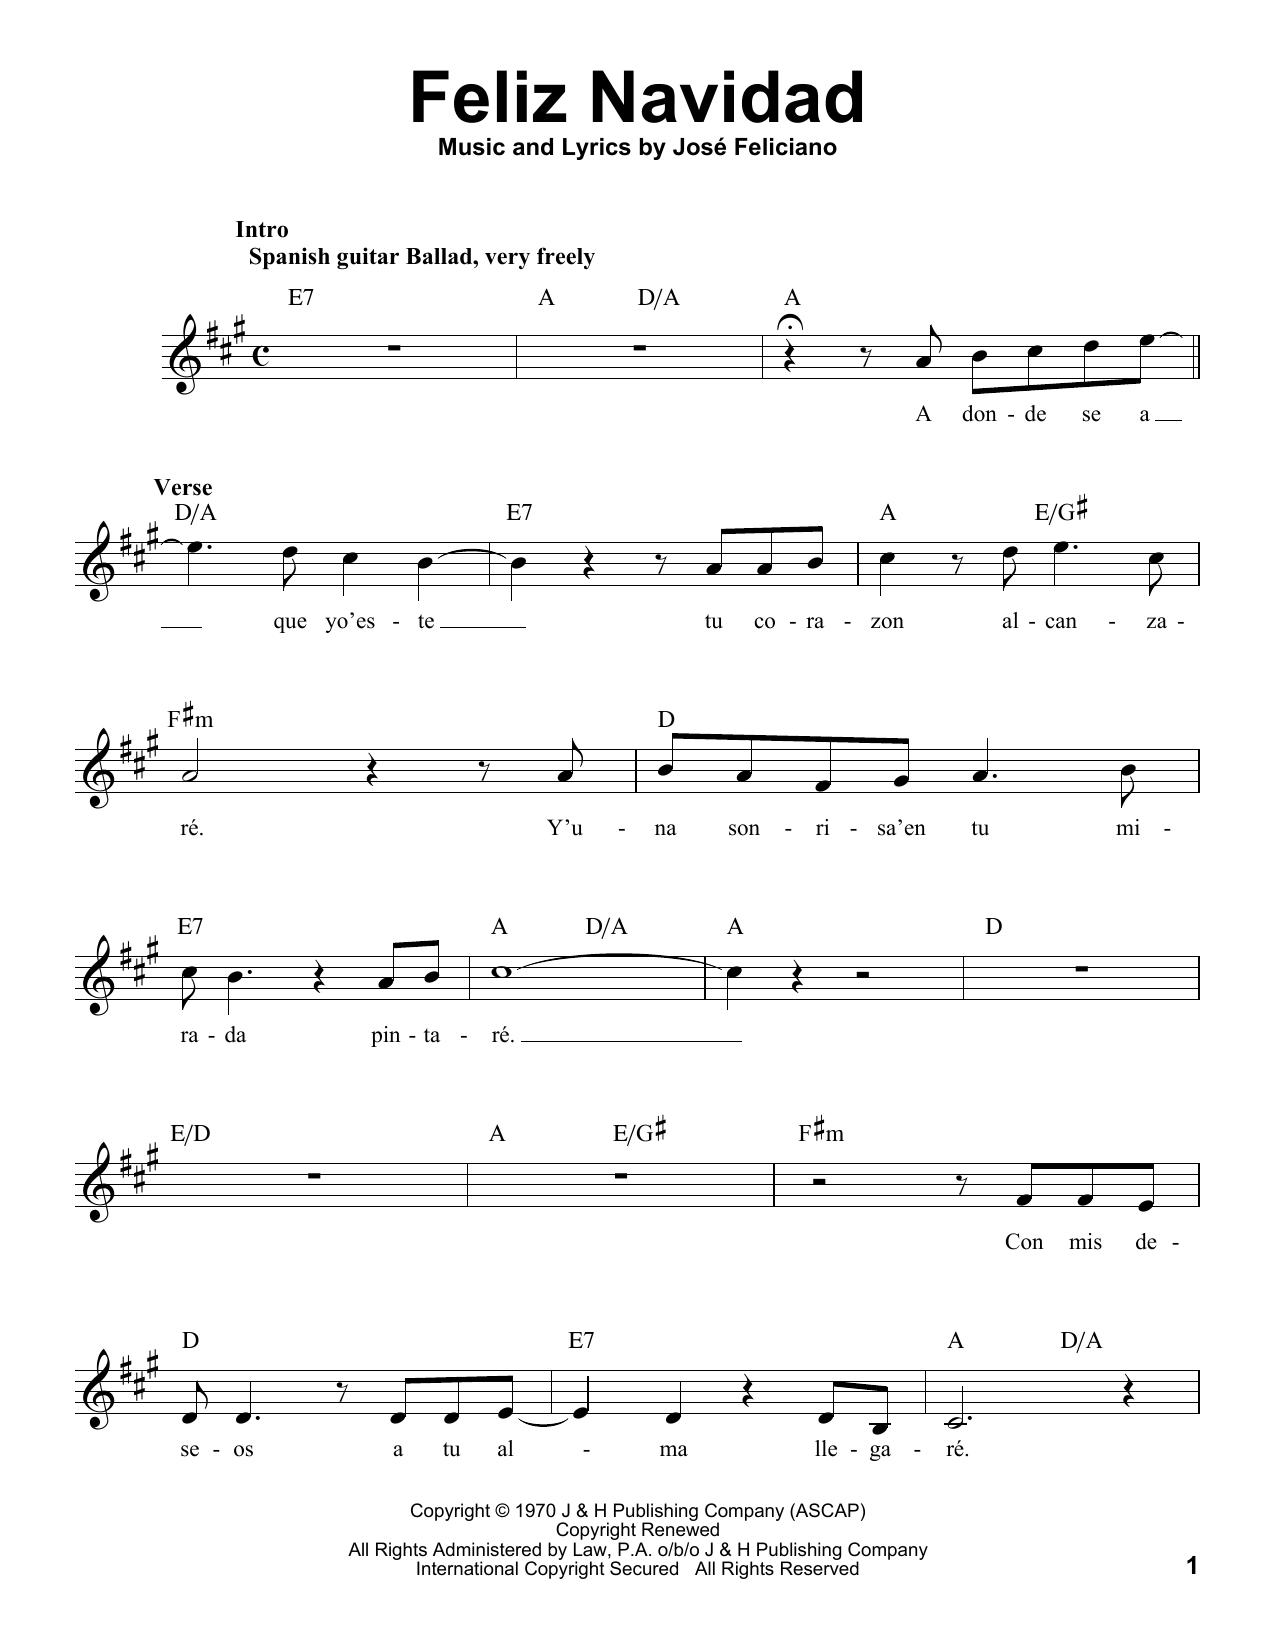 Michael Bublé Feliz Navidad 250583 in 2020 | Sheet music ...